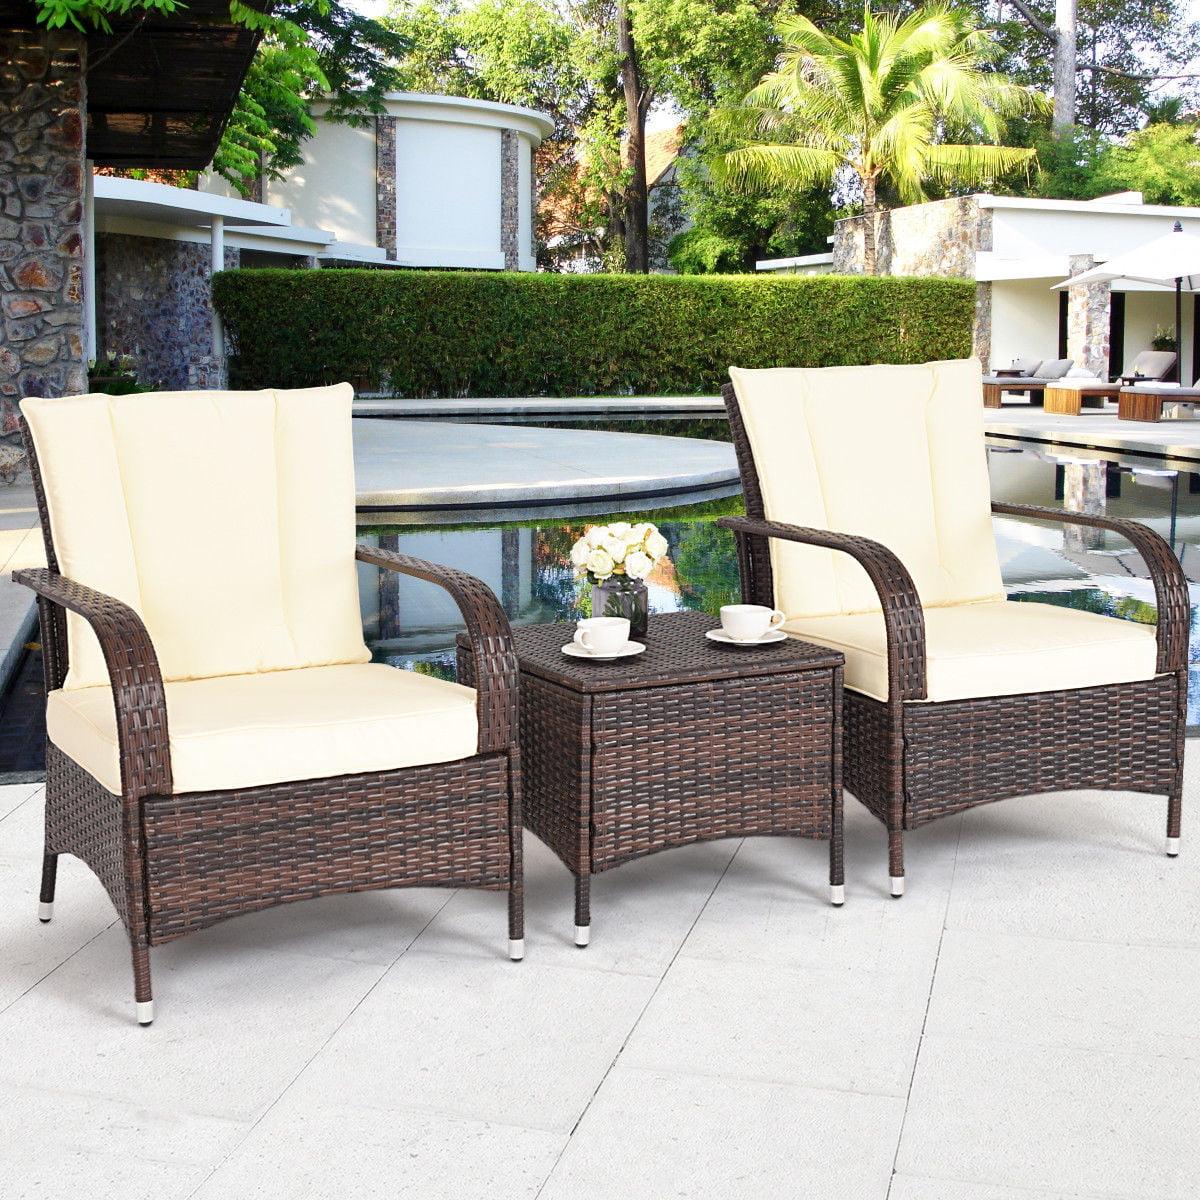 Costway 3PCS Outdoor Patio Mix Brown Rattan Wicker Furniture Set Seat Cushioned Beige